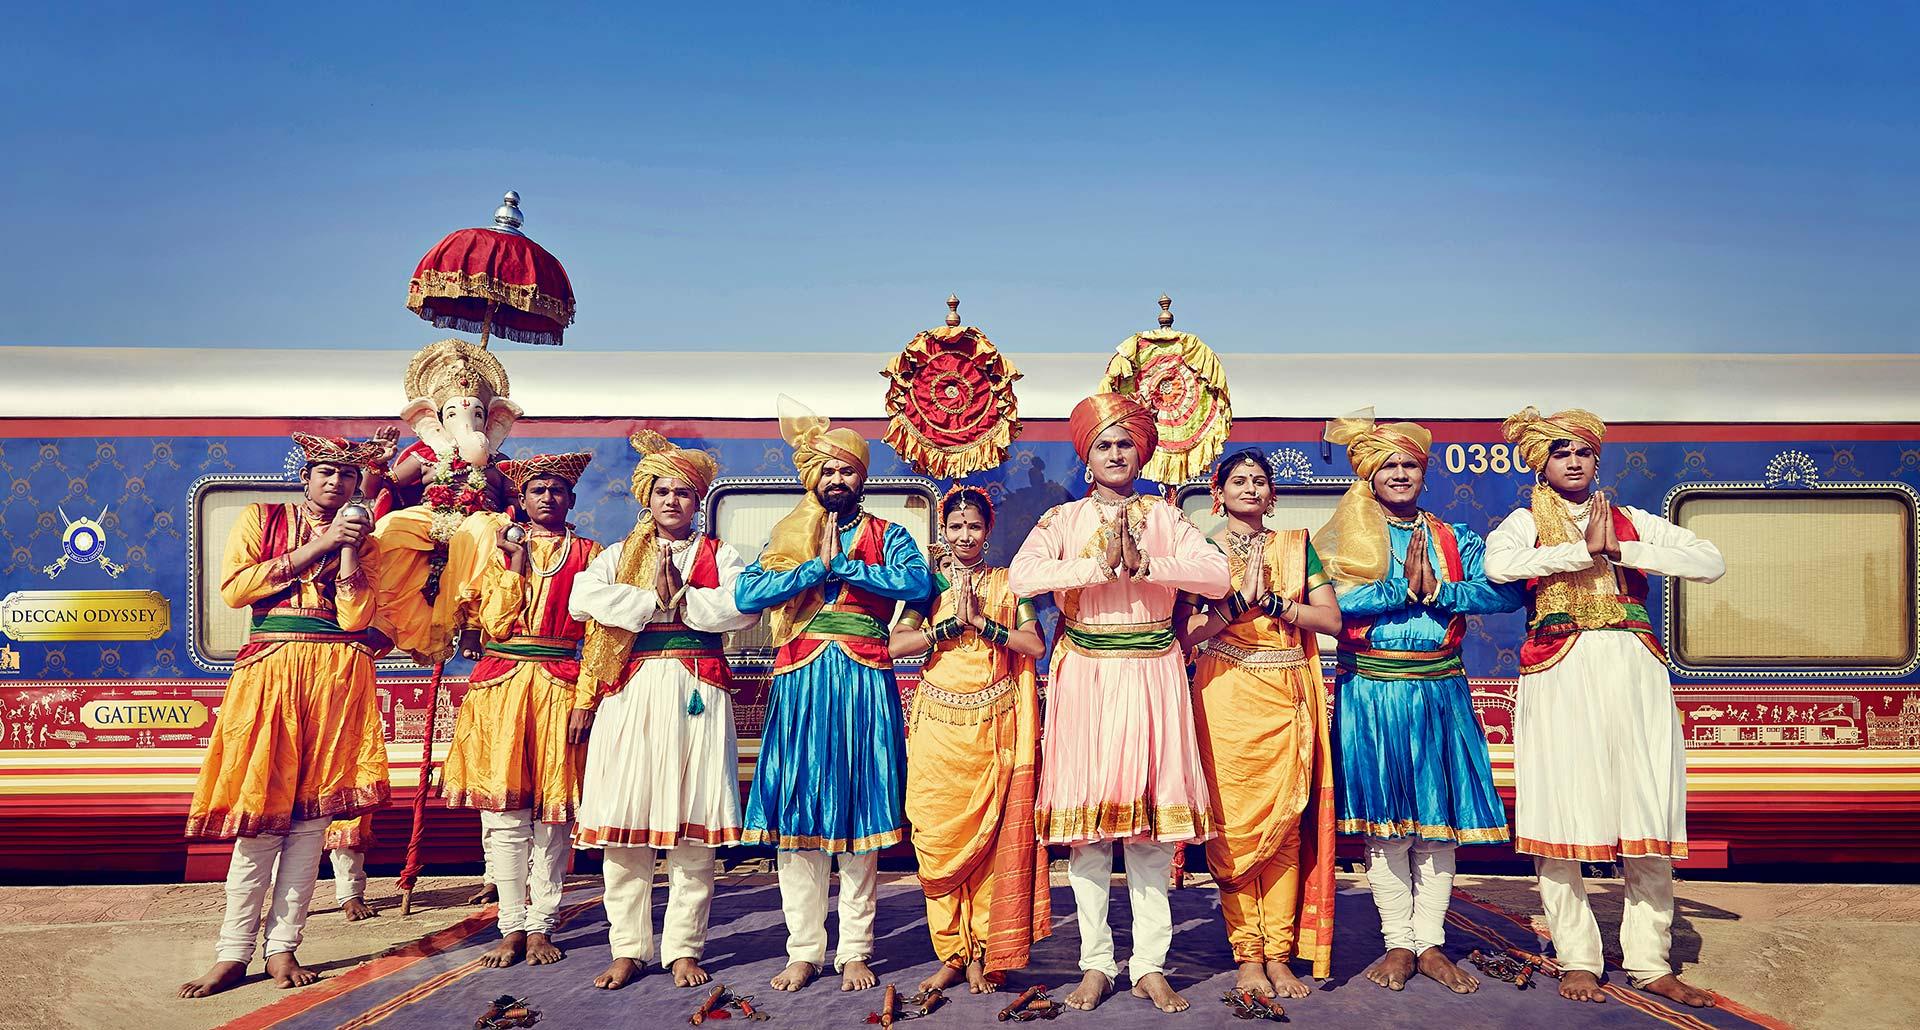 Deccan Odyssey train welcome crew in India